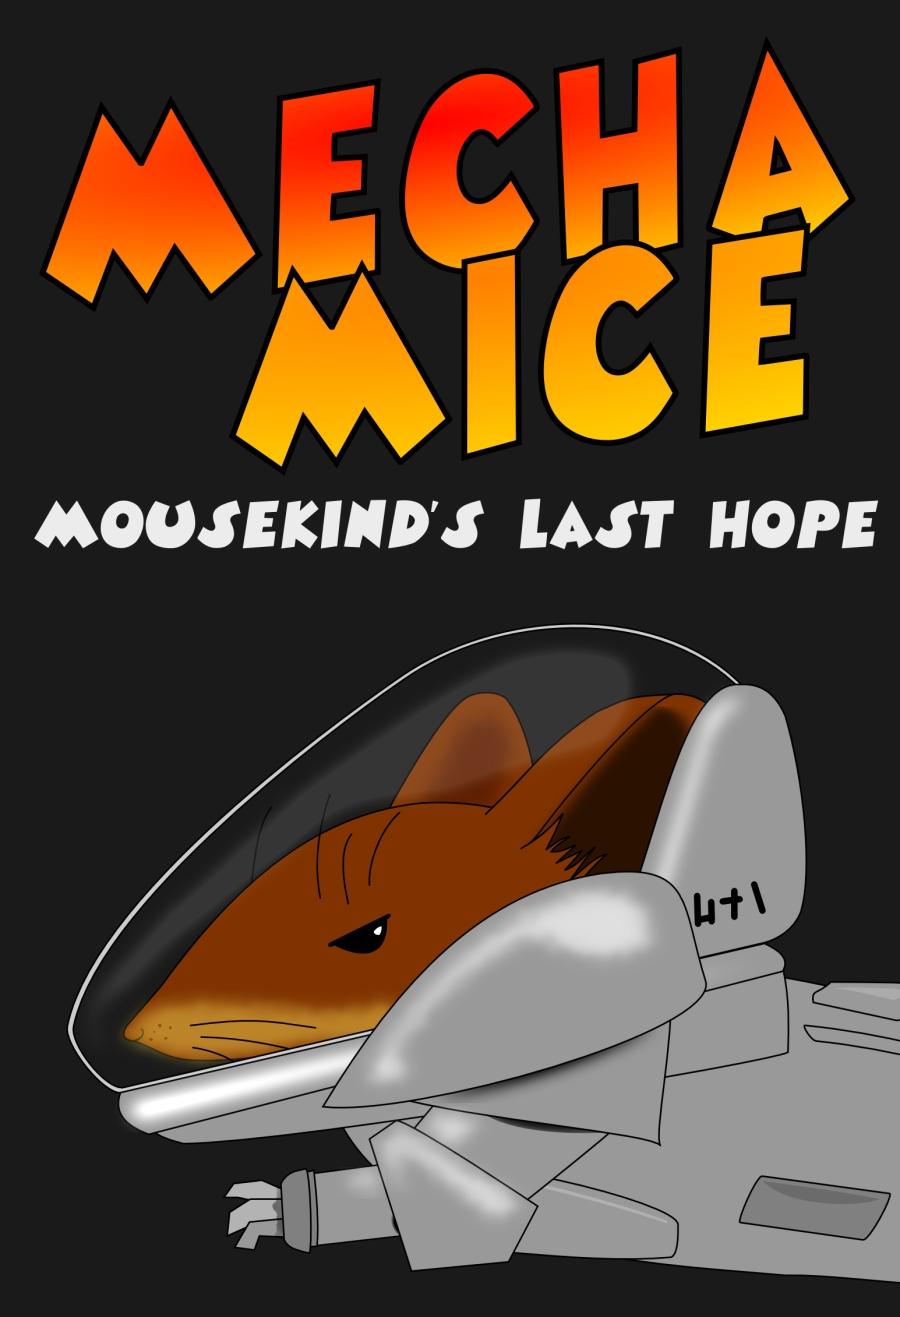 Purchase Mecha Mice